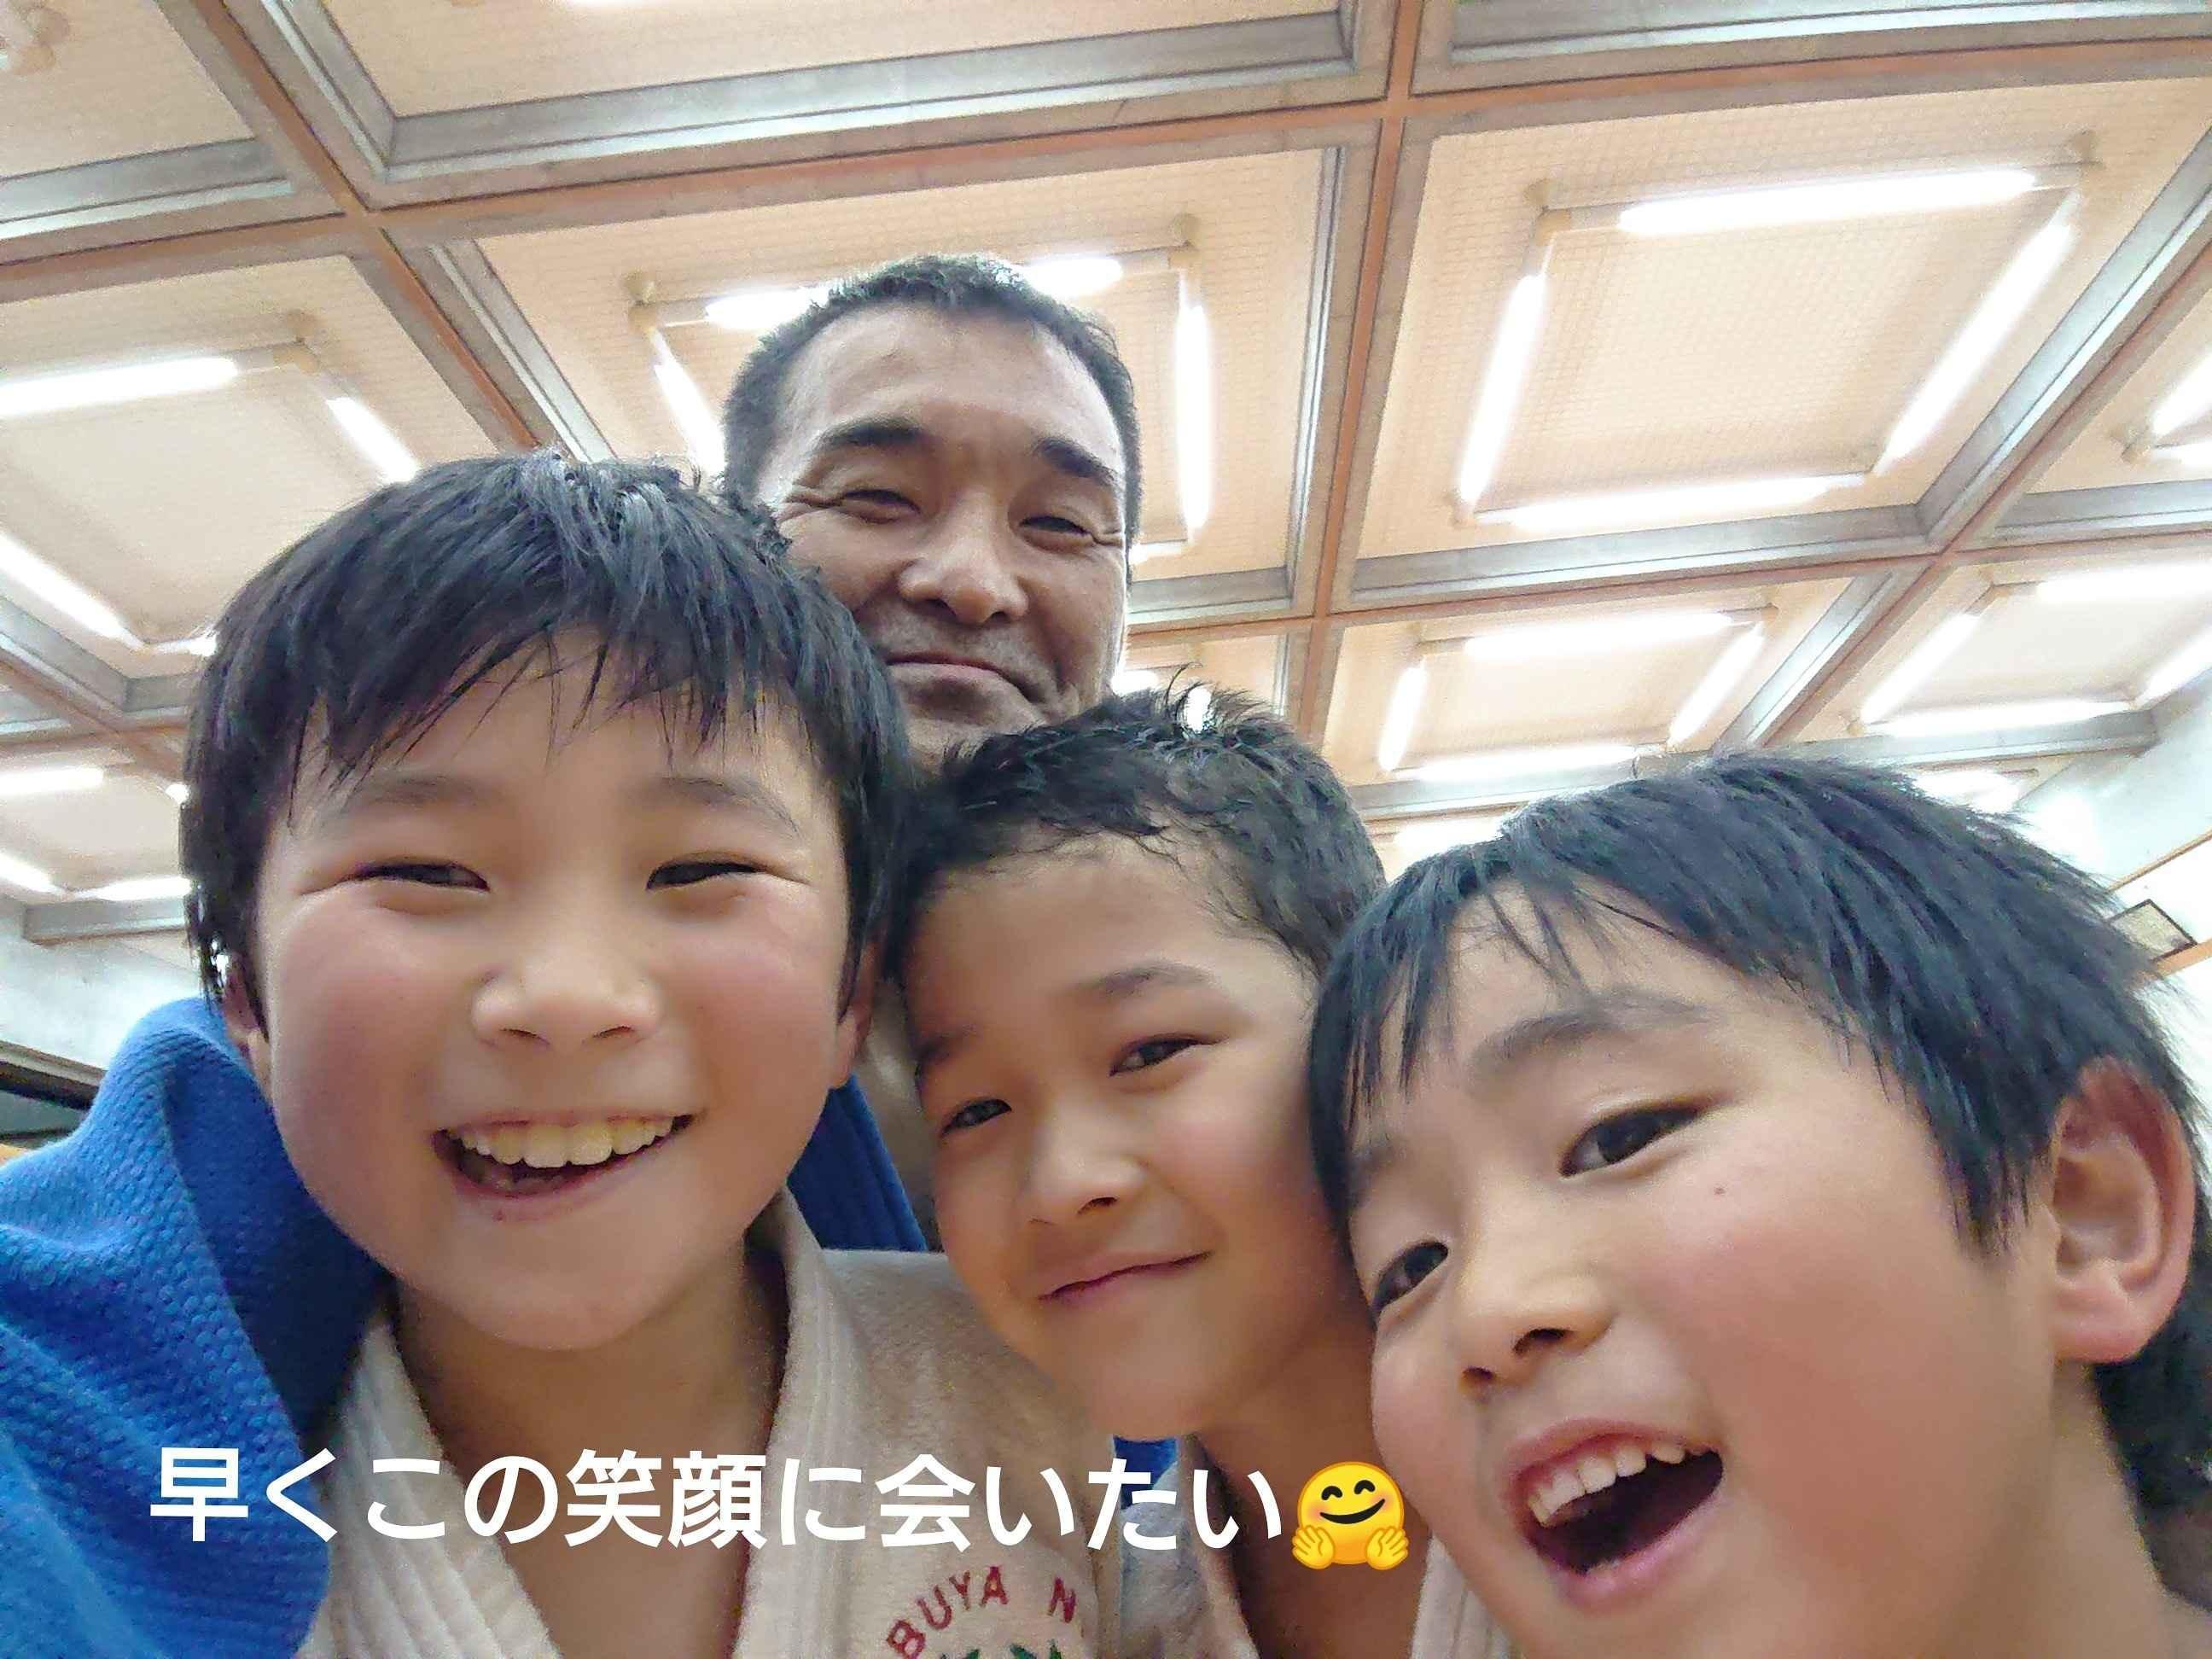 渋谷西柔道クラブ【大和市柔道教室】